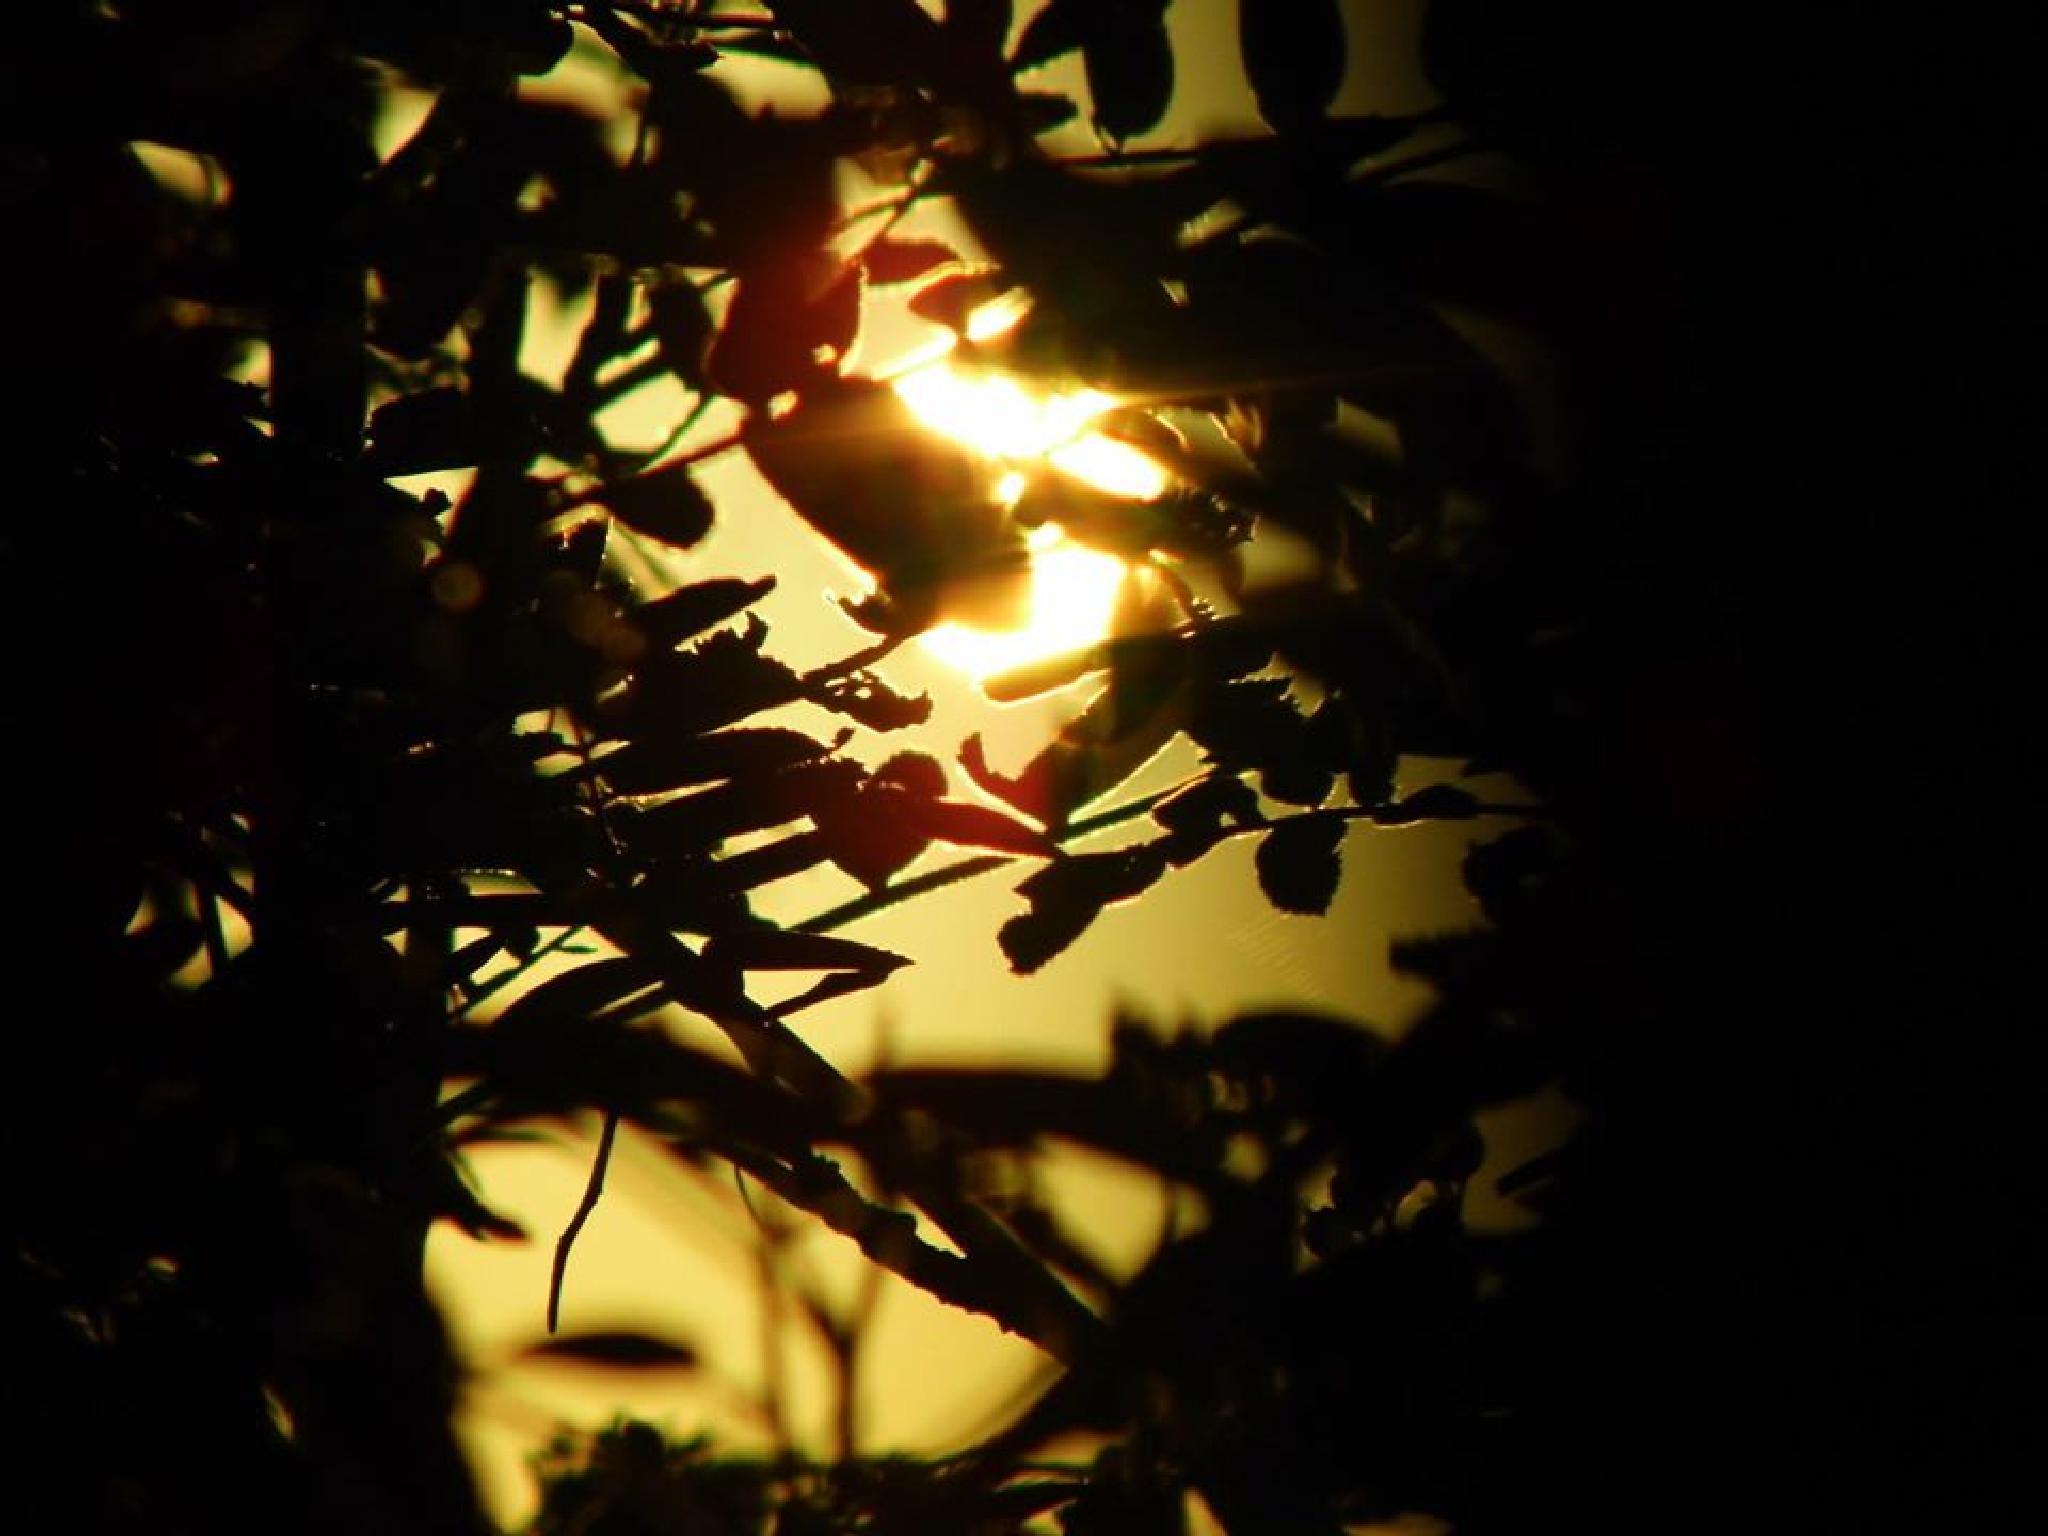 sunrise through trees by Naomi D Tillotson-Keating